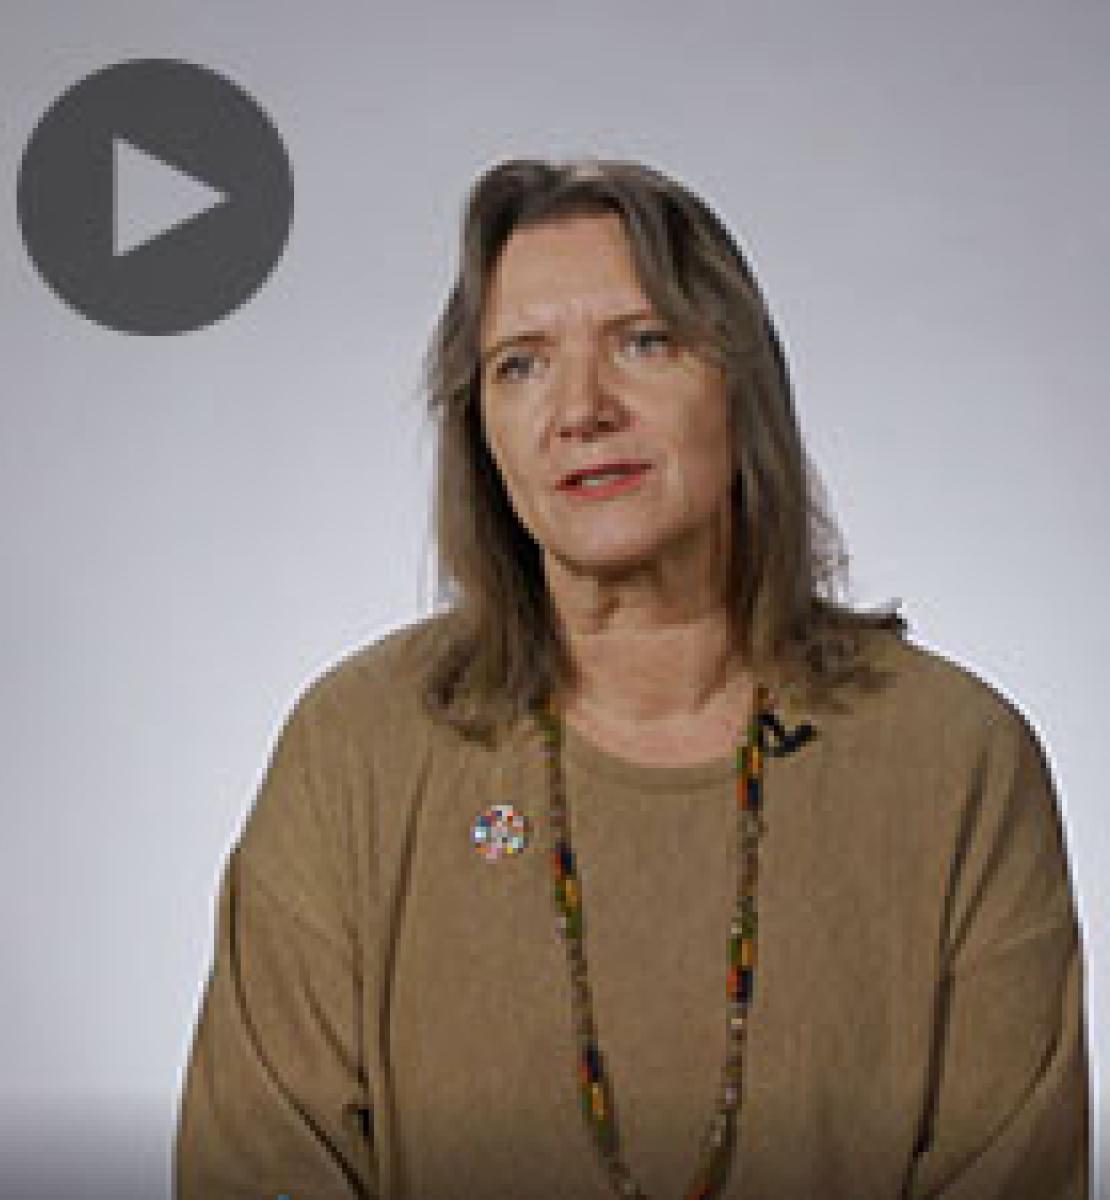 Screenshot from video message shows Resident Coordinator, Birgit Gerstenberg